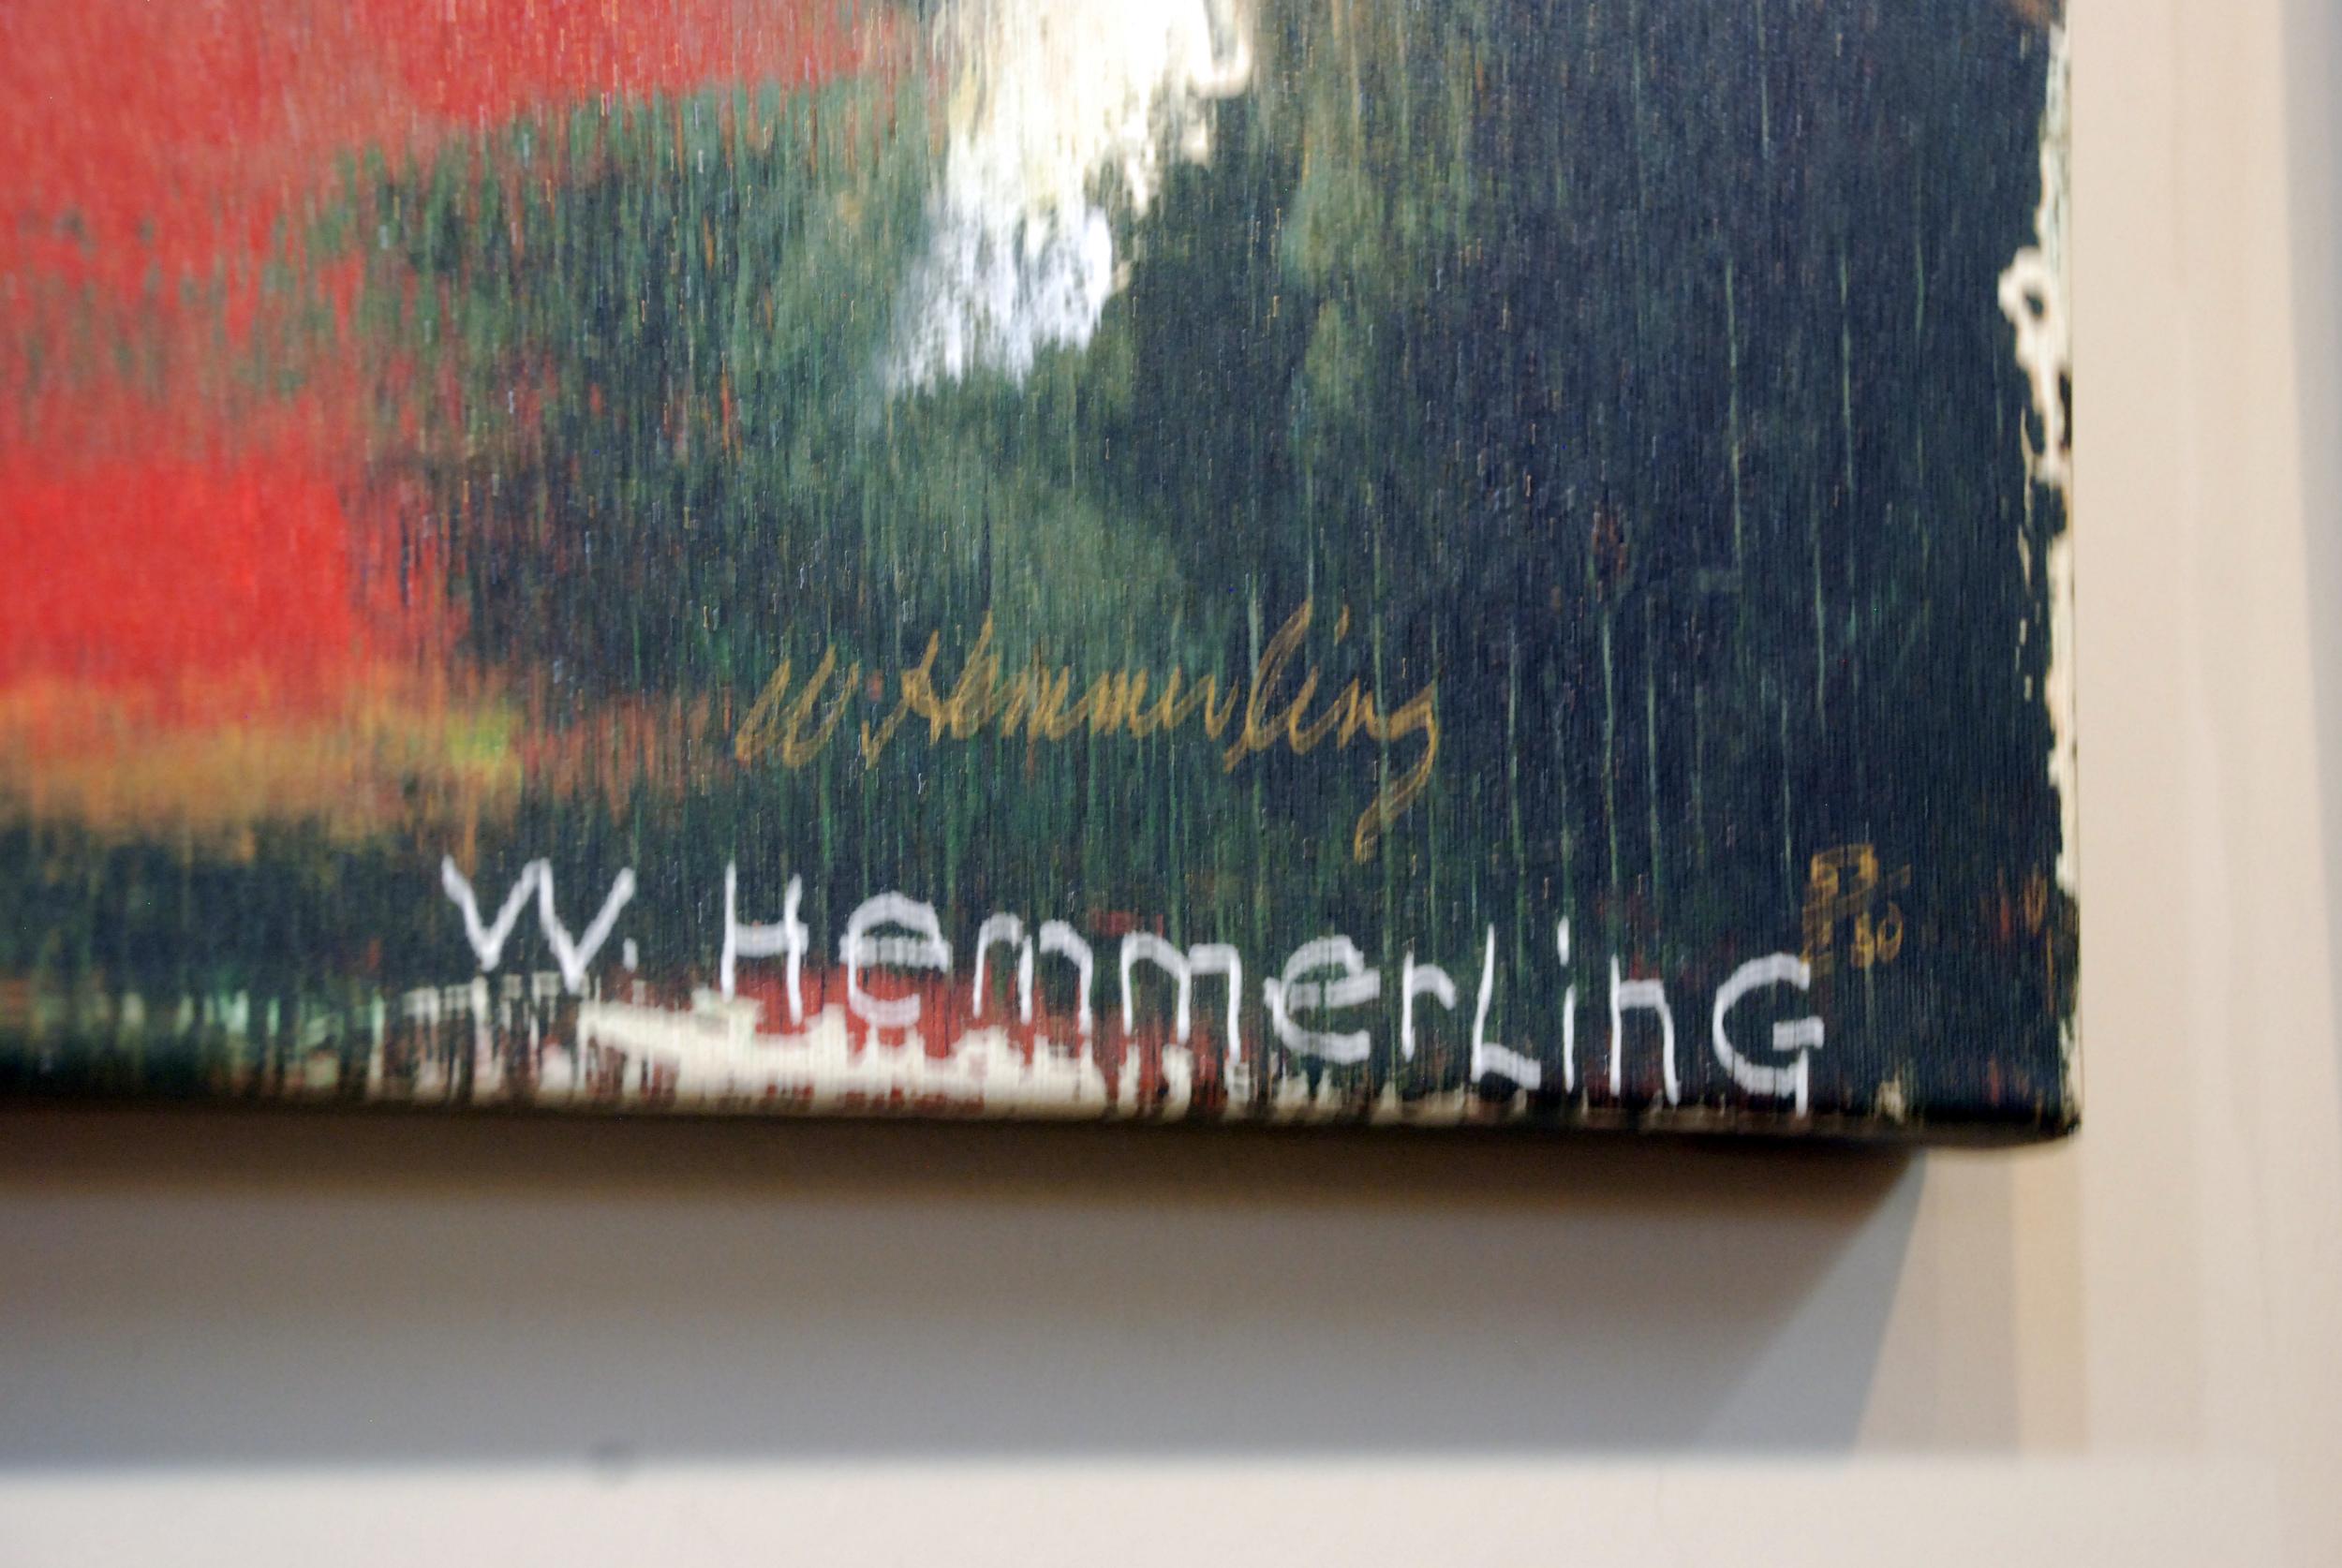 CH-Hemmerling-HeartsofGold-sign.jpg